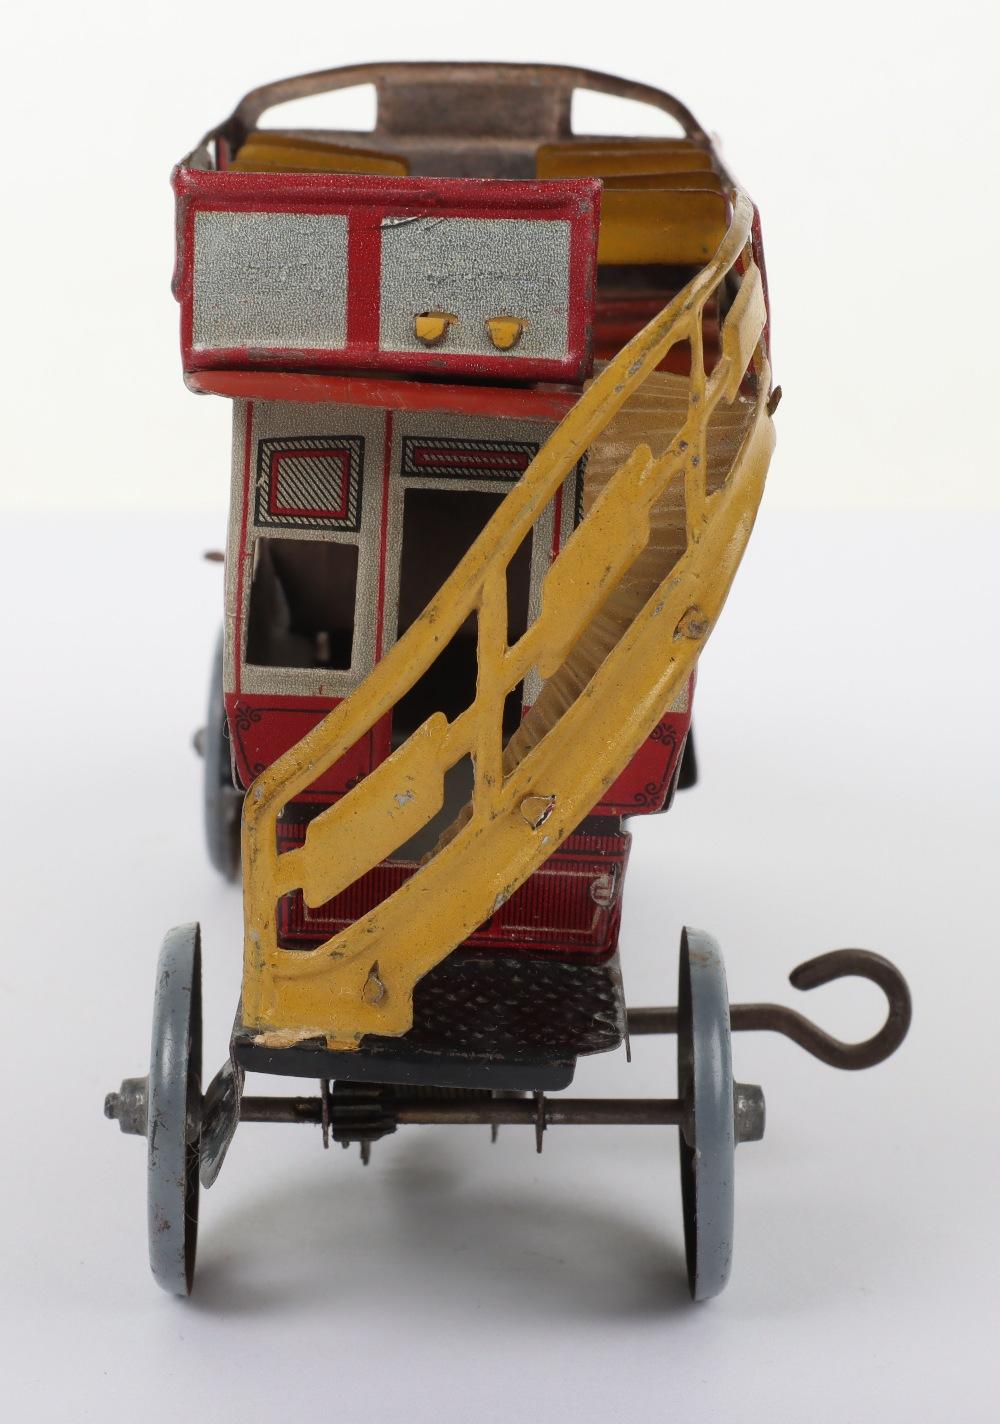 A Scarce Distler (German) Double Decker Tinplate Bus - Image 6 of 6